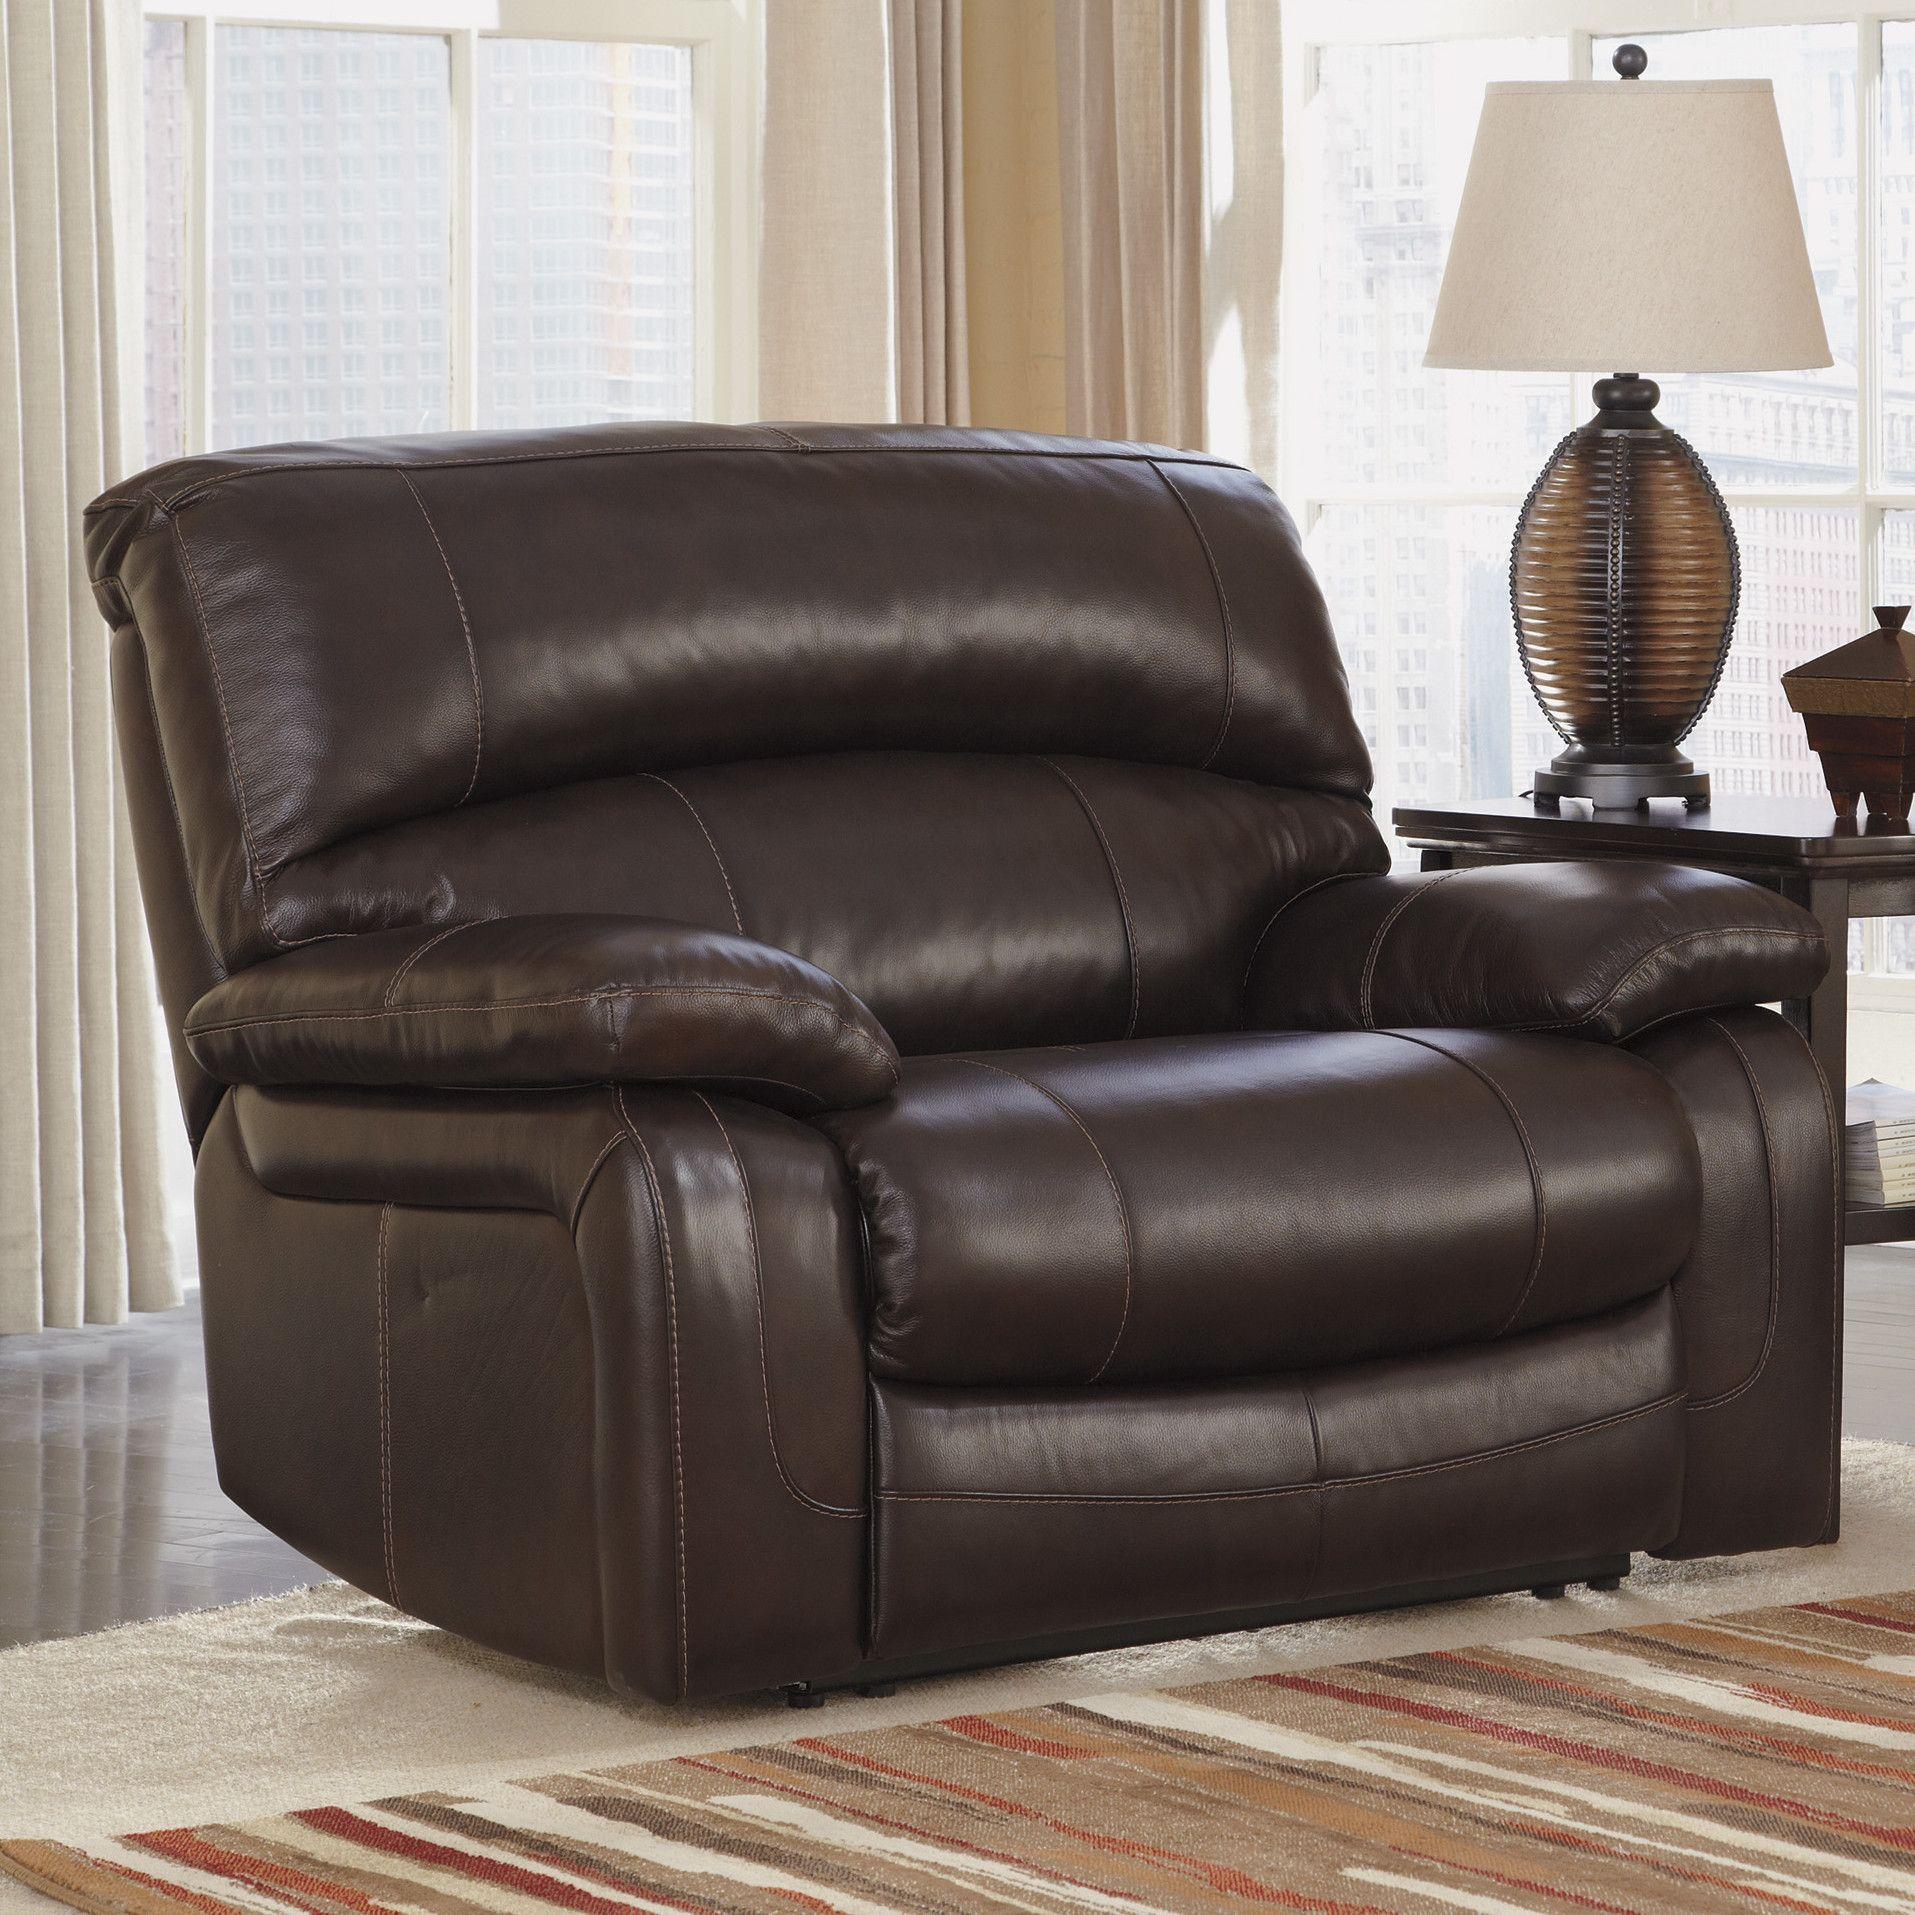 Tremendous I Like The Size But Want Better Quality Dormont Zero Wall Spiritservingveterans Wood Chair Design Ideas Spiritservingveteransorg